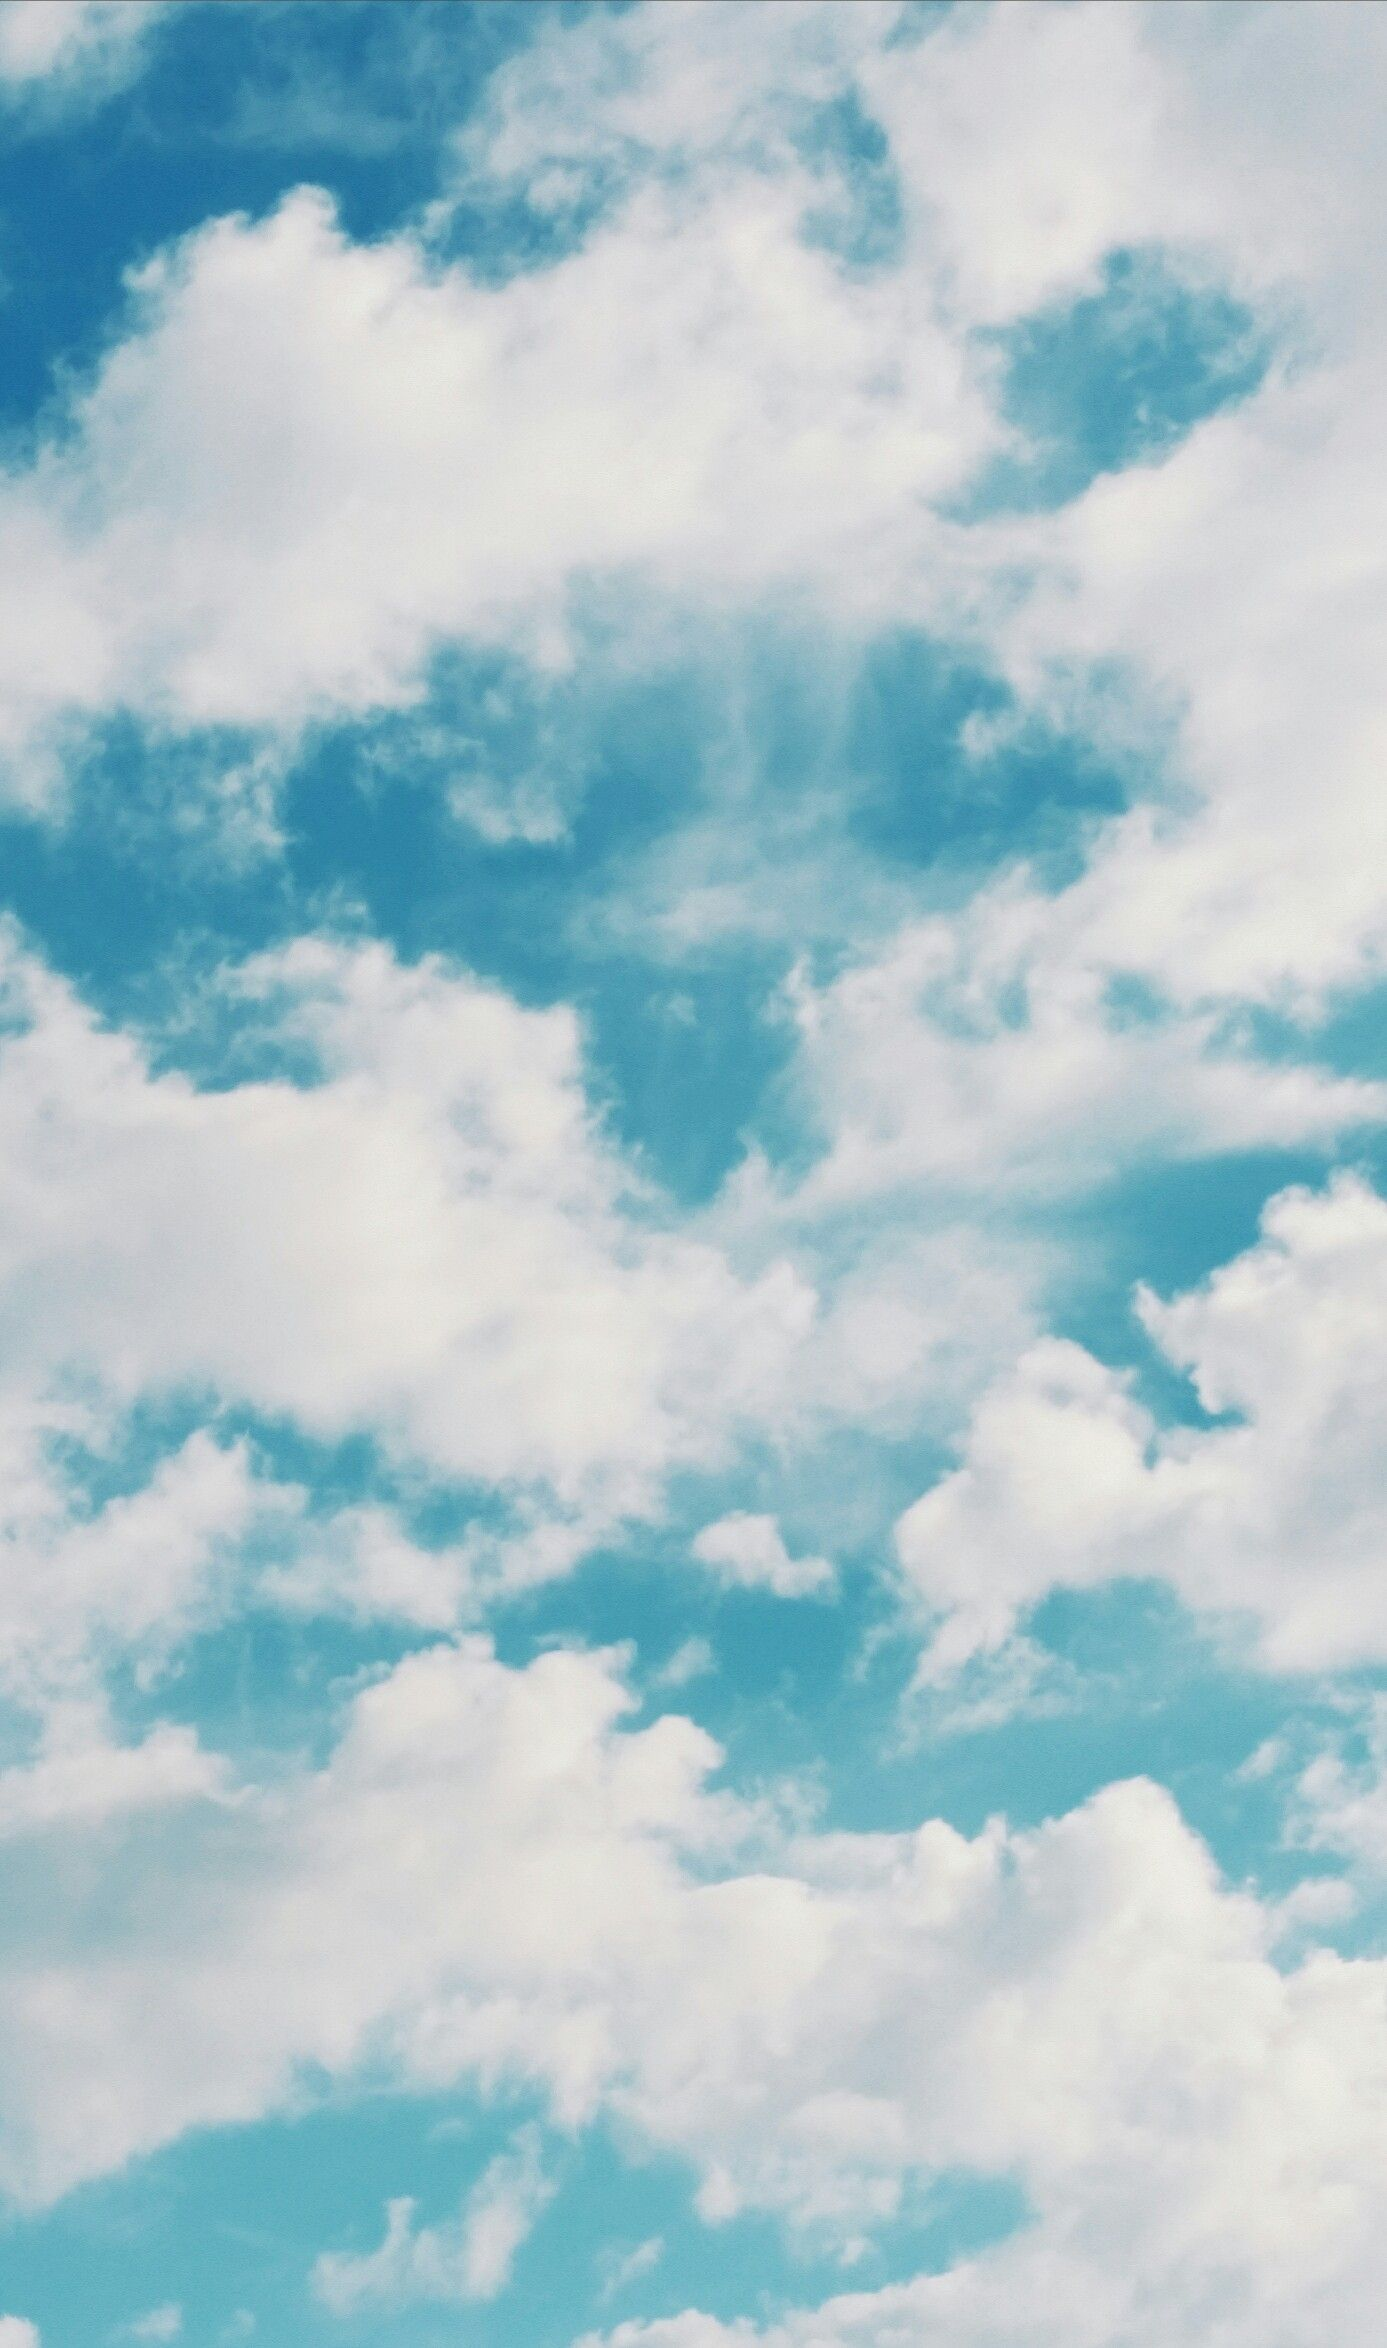 iphone background light blue aesthetic blue sky